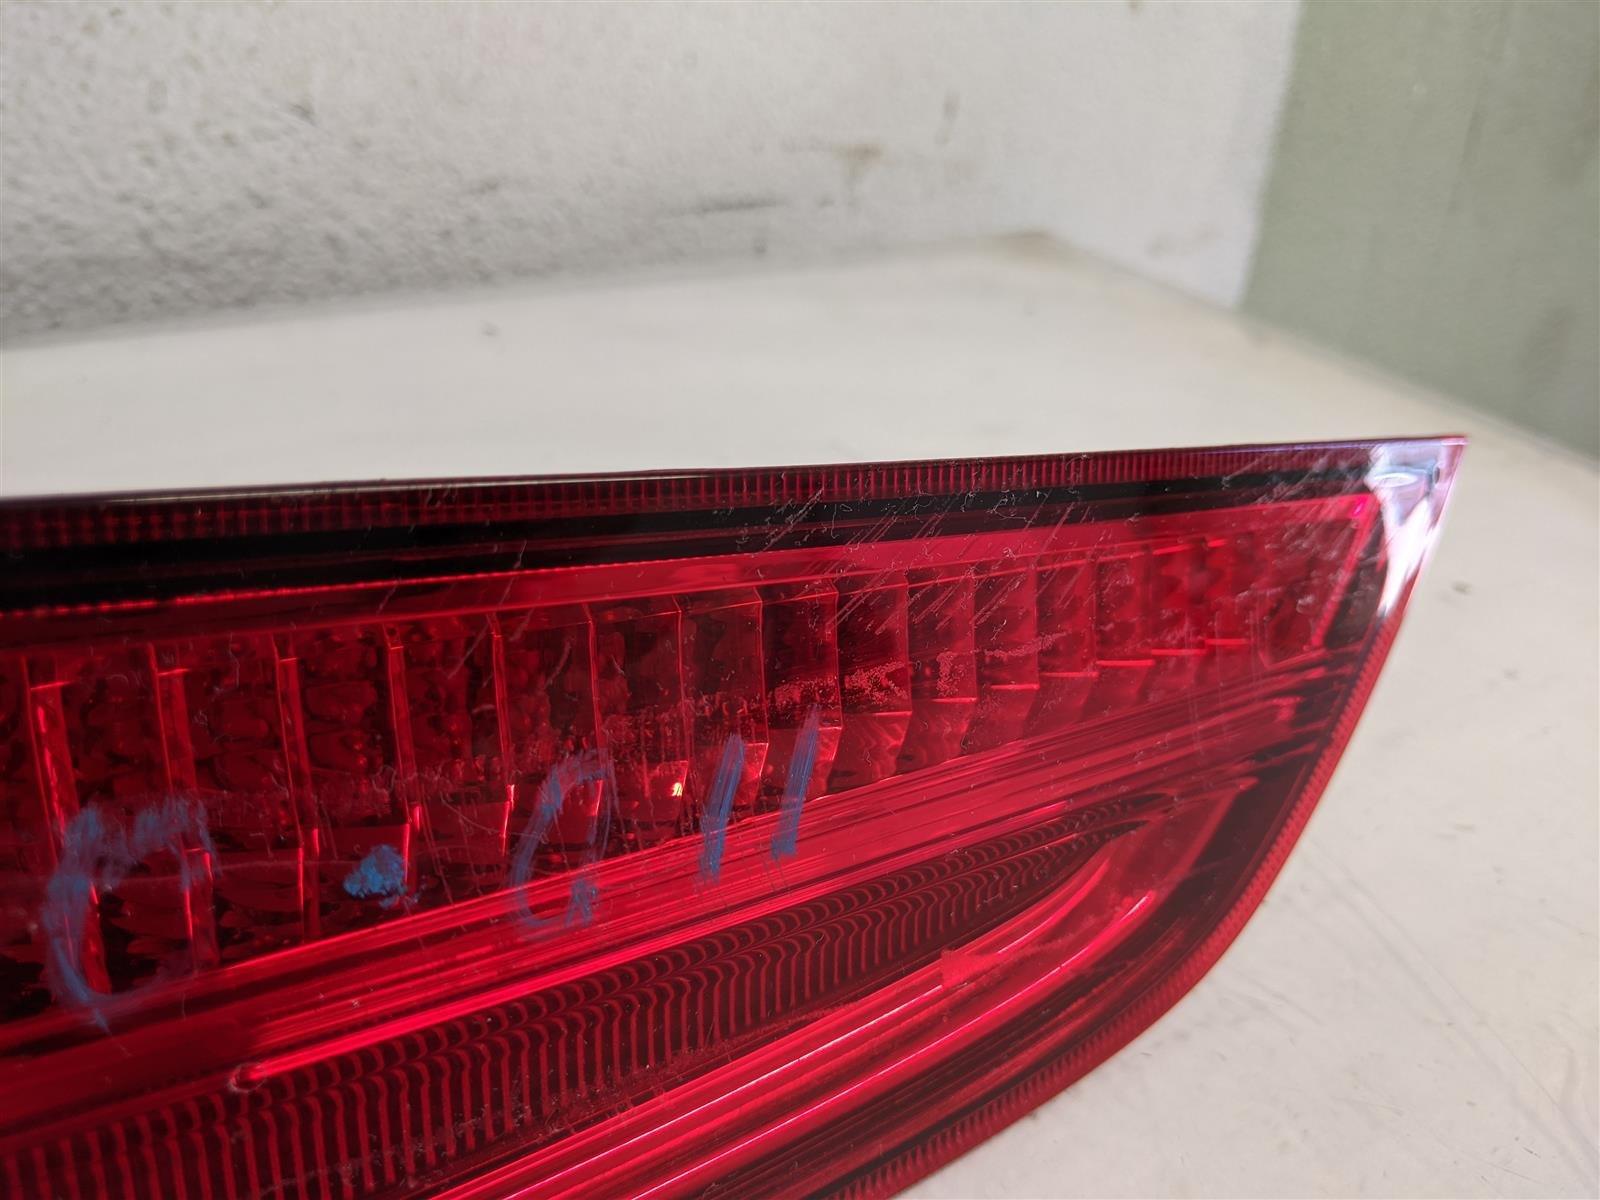 2017 Honda Pilot Passenger Tail Light Lamp, Liftgate Mounted Replacement